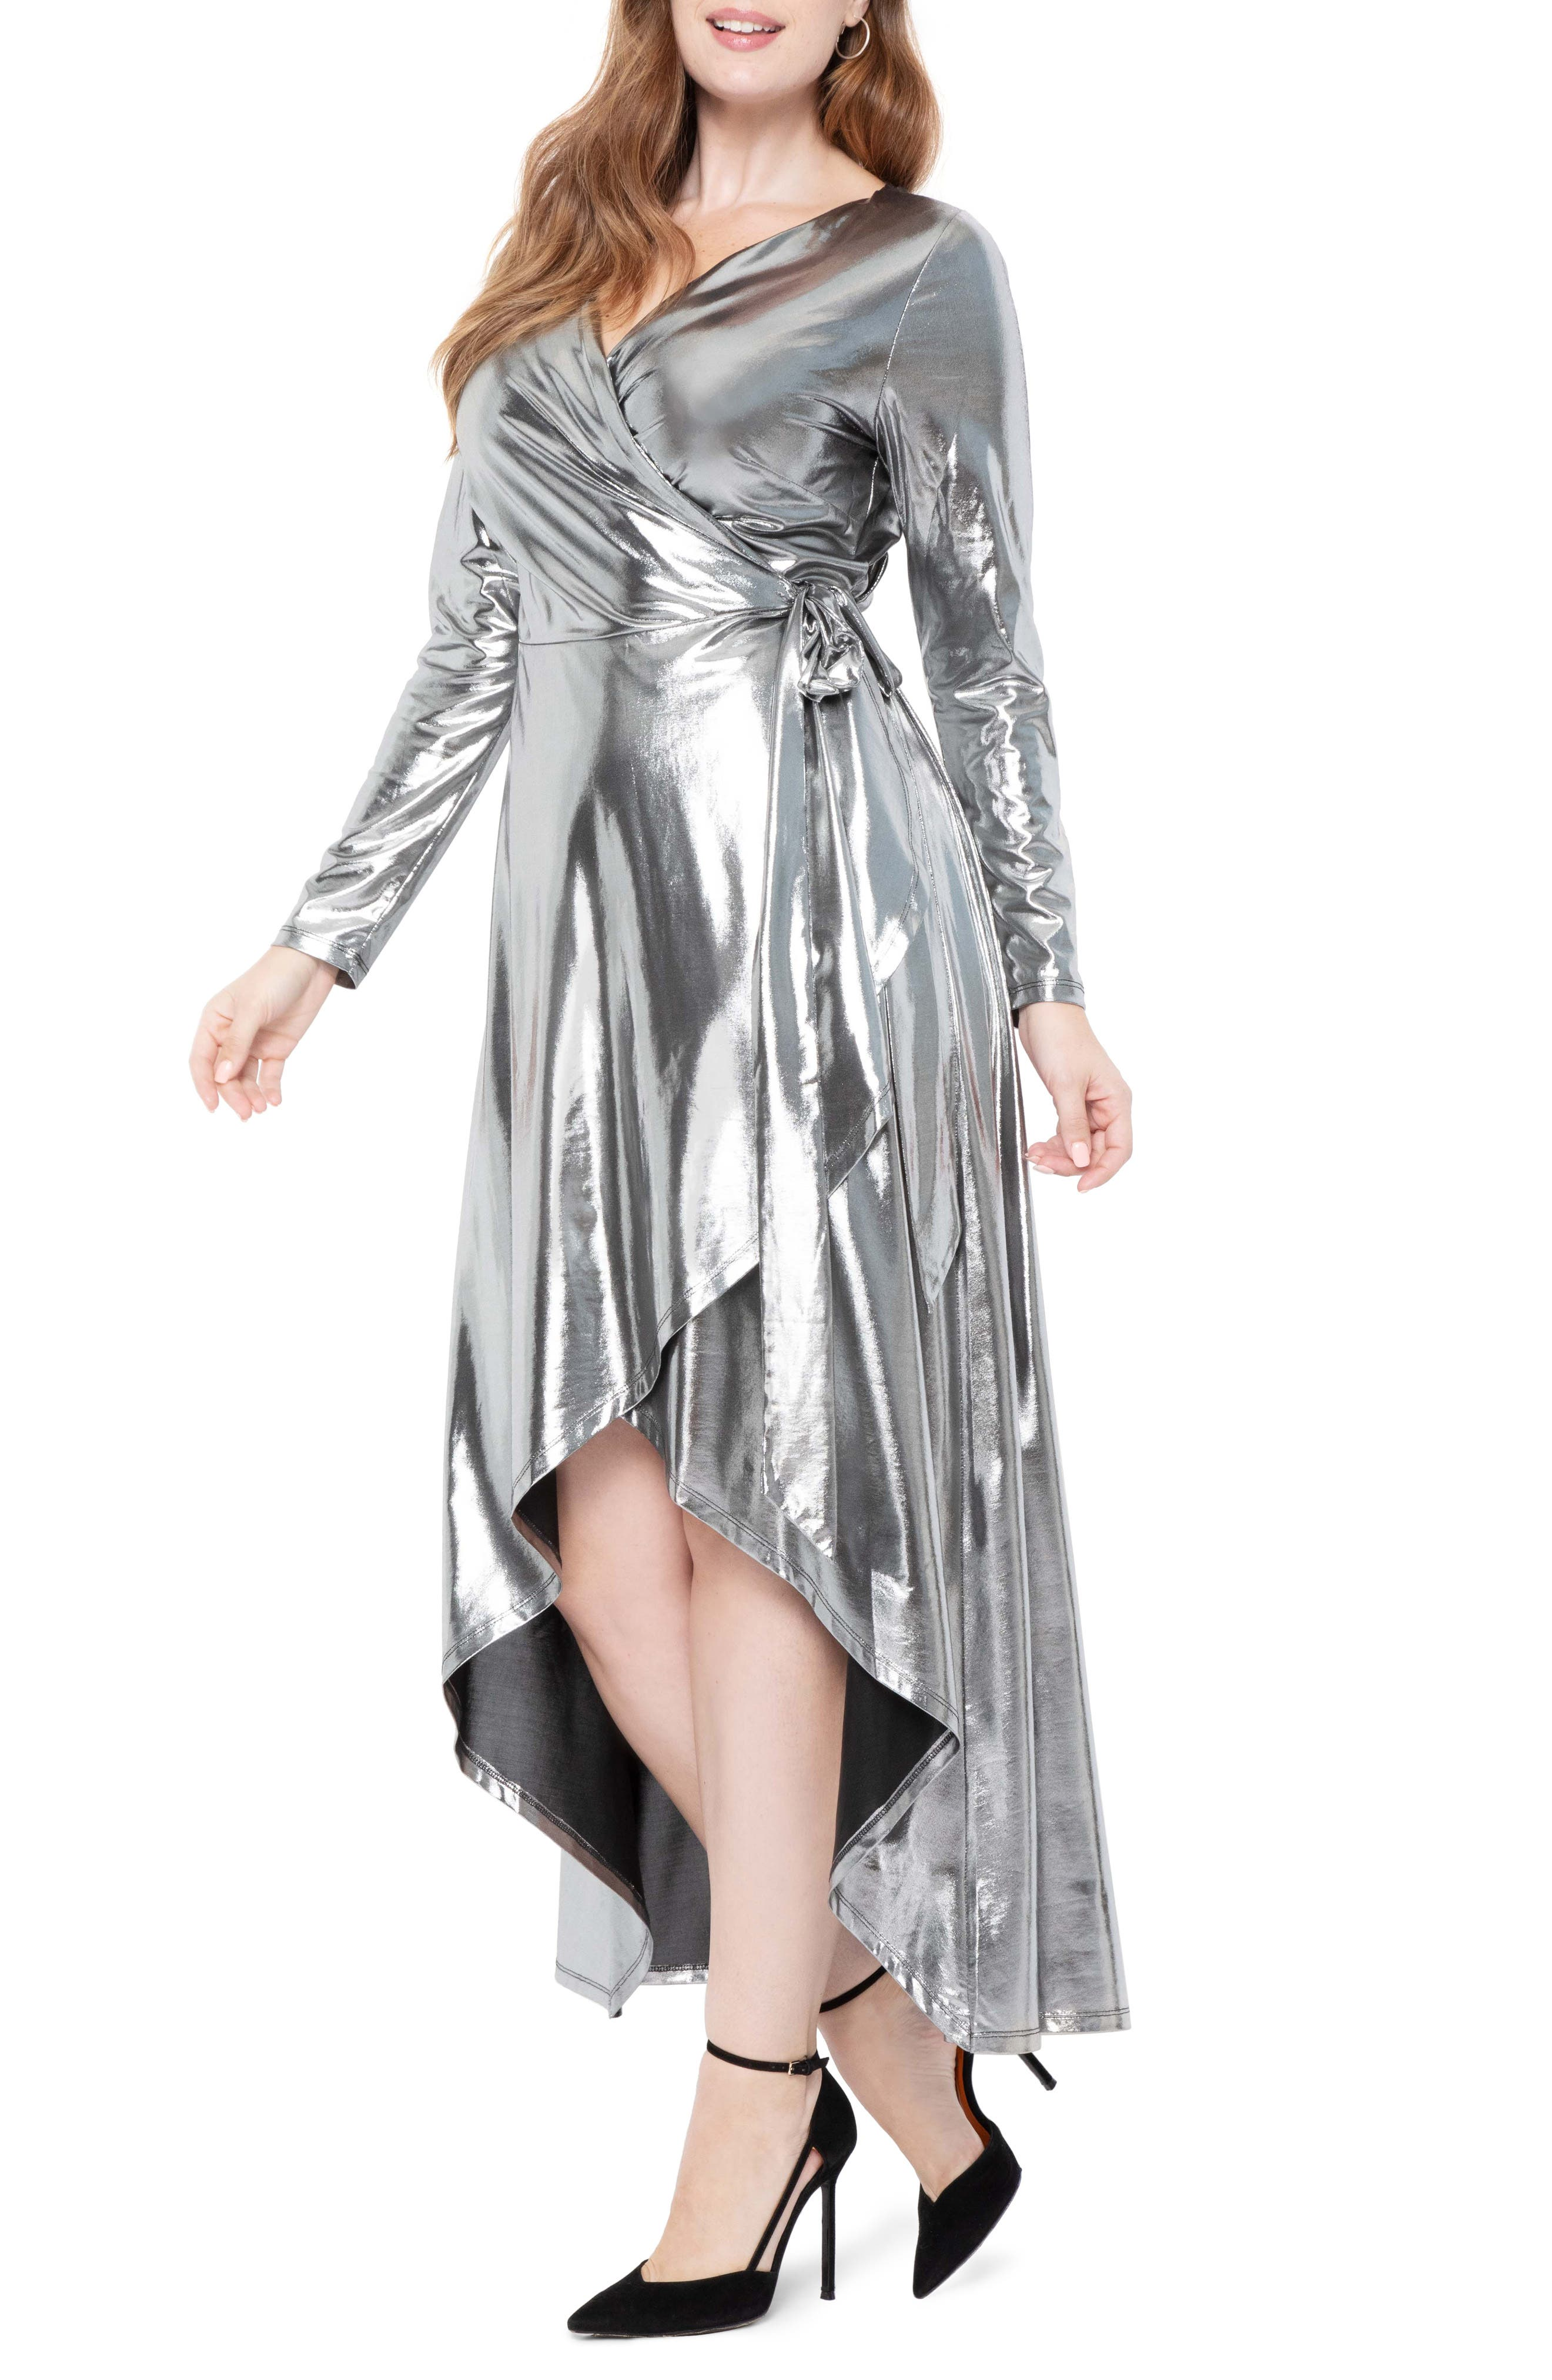 70s Prom, Formal, Evening, Party Dresses Plus Size Womens Eloquii Metallic Long Sleeve Jersey Wrap Maxi Dress Size 28W - Metallic $139.95 AT vintagedancer.com